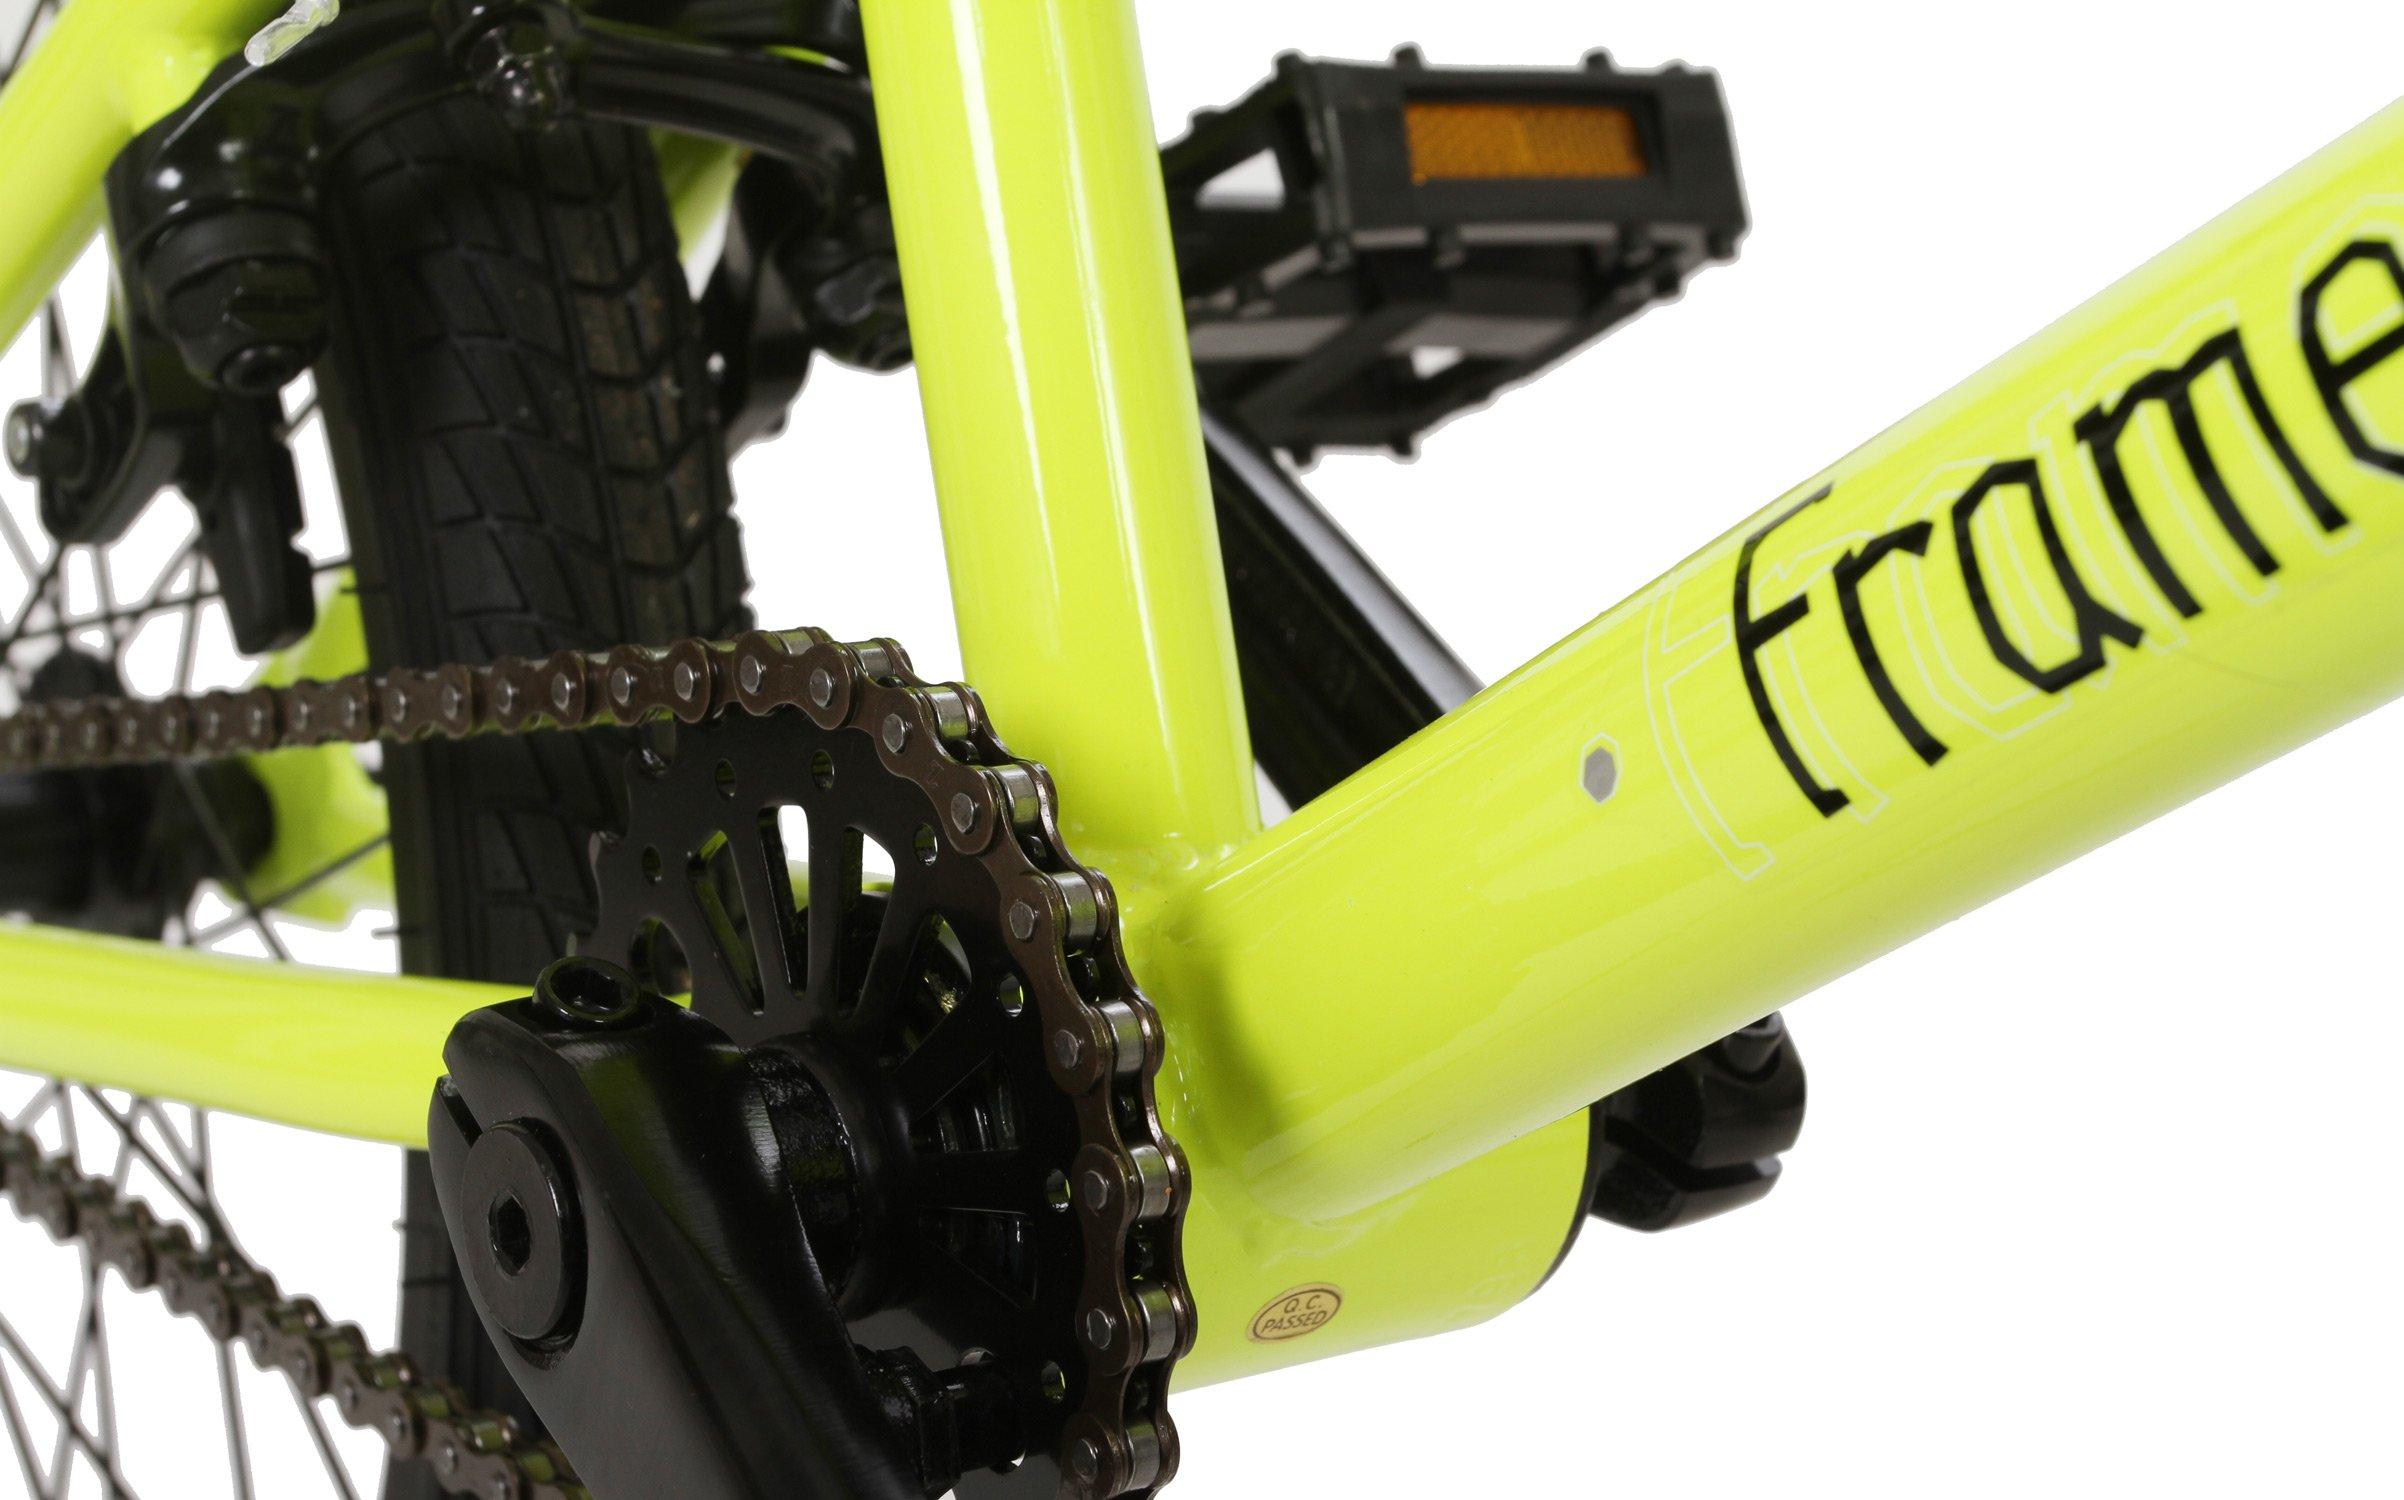 Framed Team BMX Bike Sz 20in by Framed (Image #5)